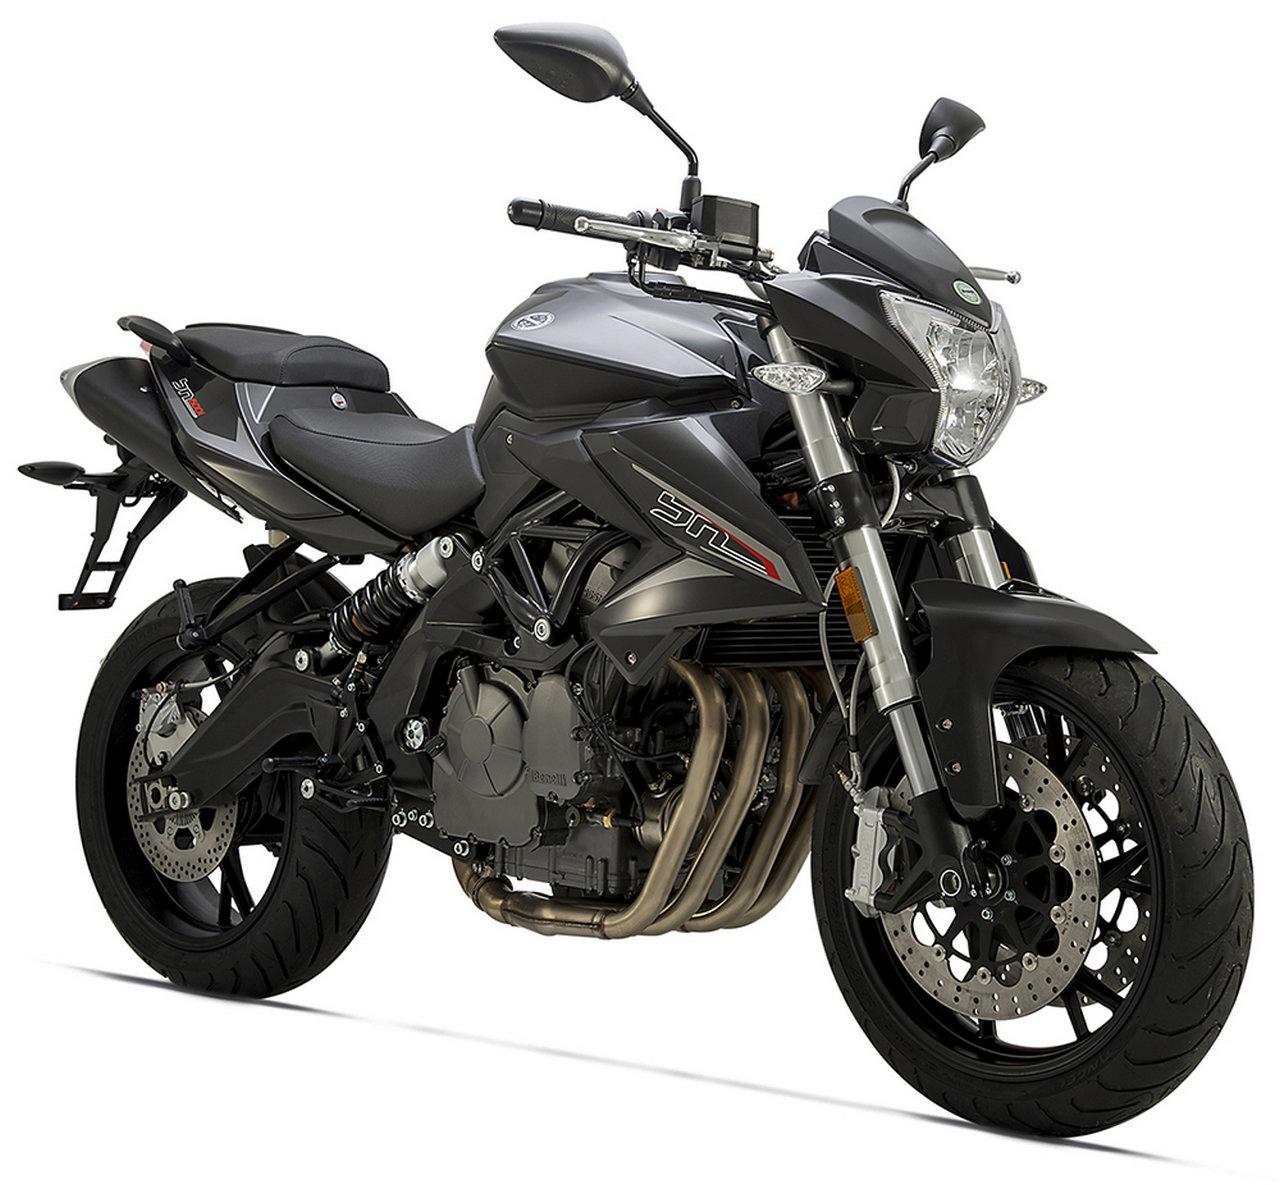 Мотоцикл Benelli BN 600 R 2015 характеристики, фотографии